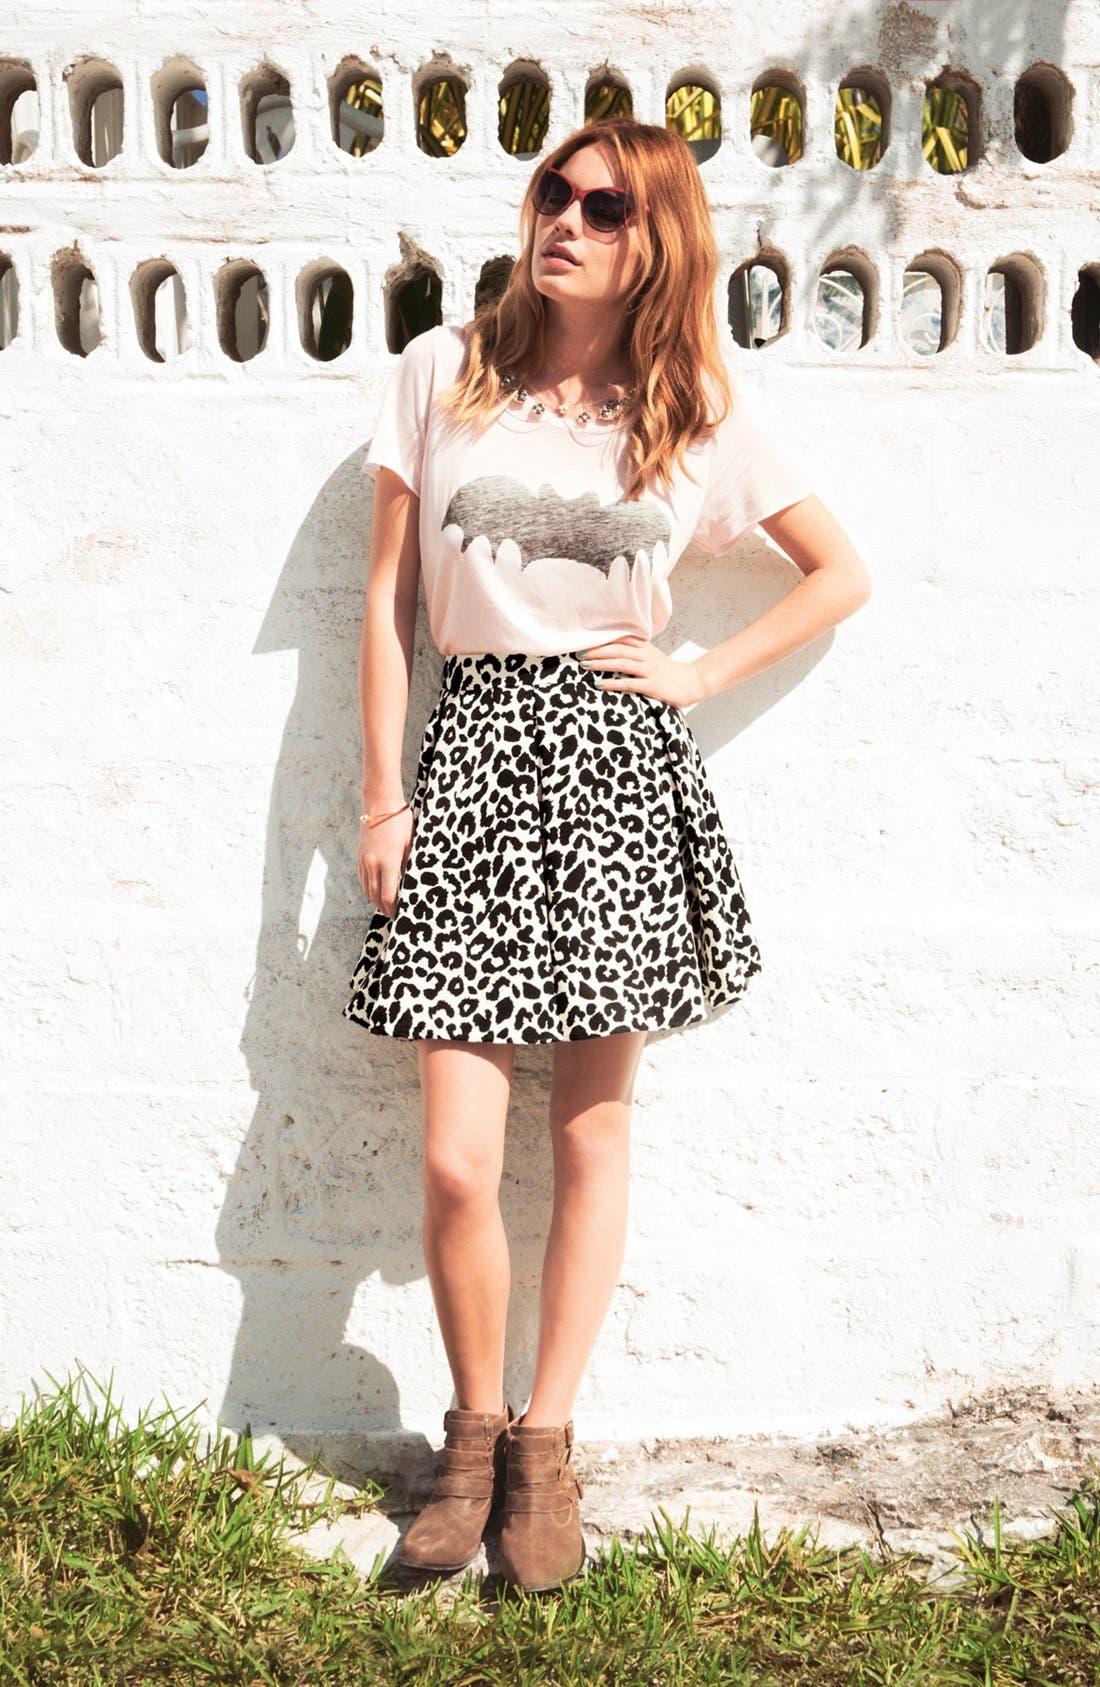 Main Image - Zoe Karssen Tee & Collective Concepts Skirt